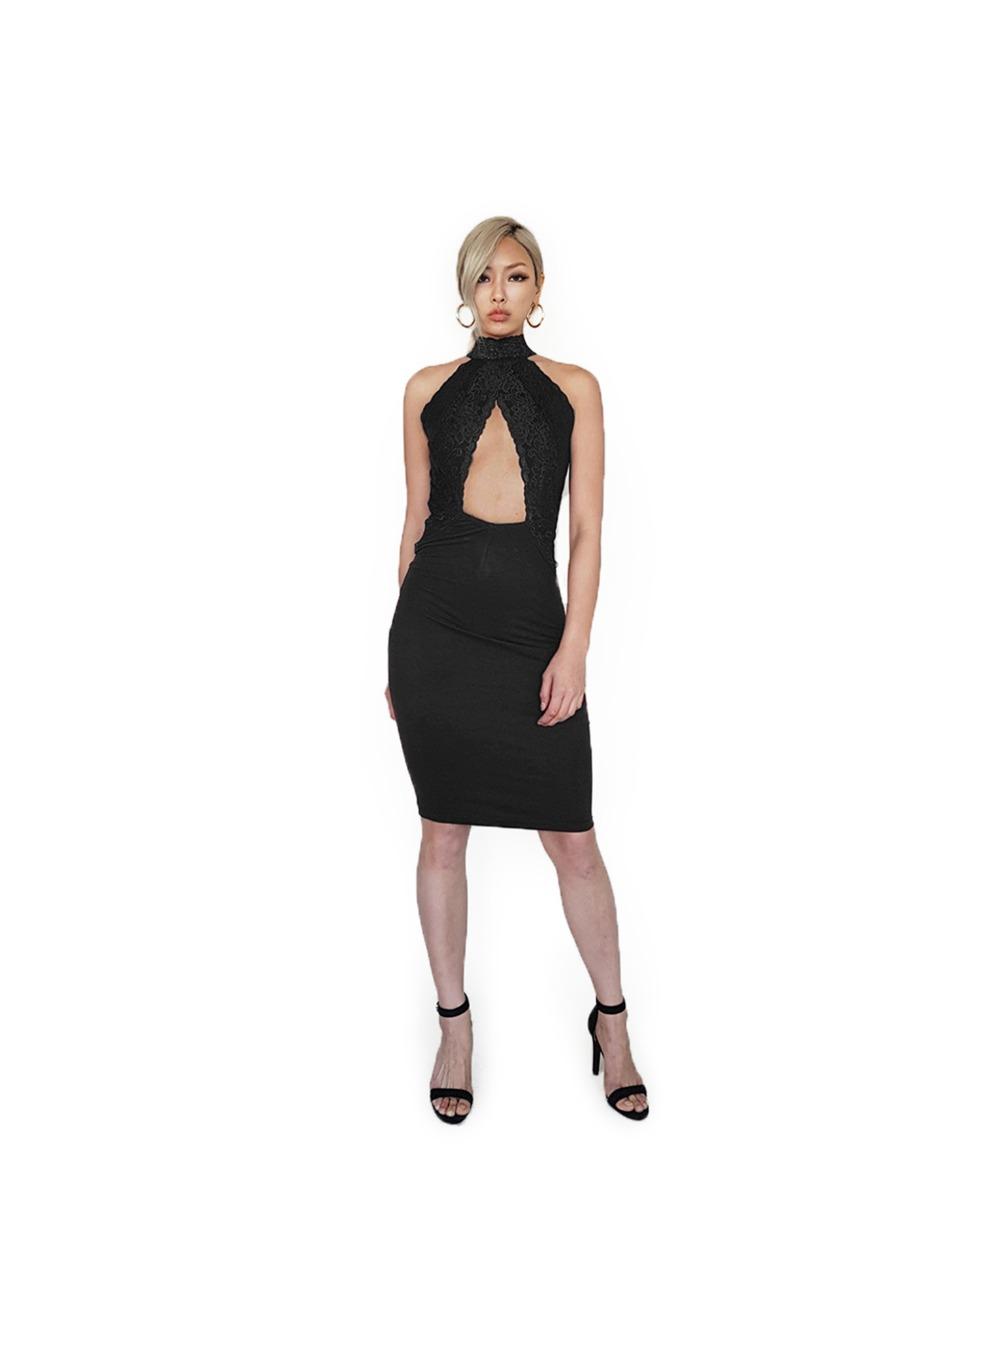 ROSALIA HALTER NECK DRESS 로살리아 홀터넥 드레스